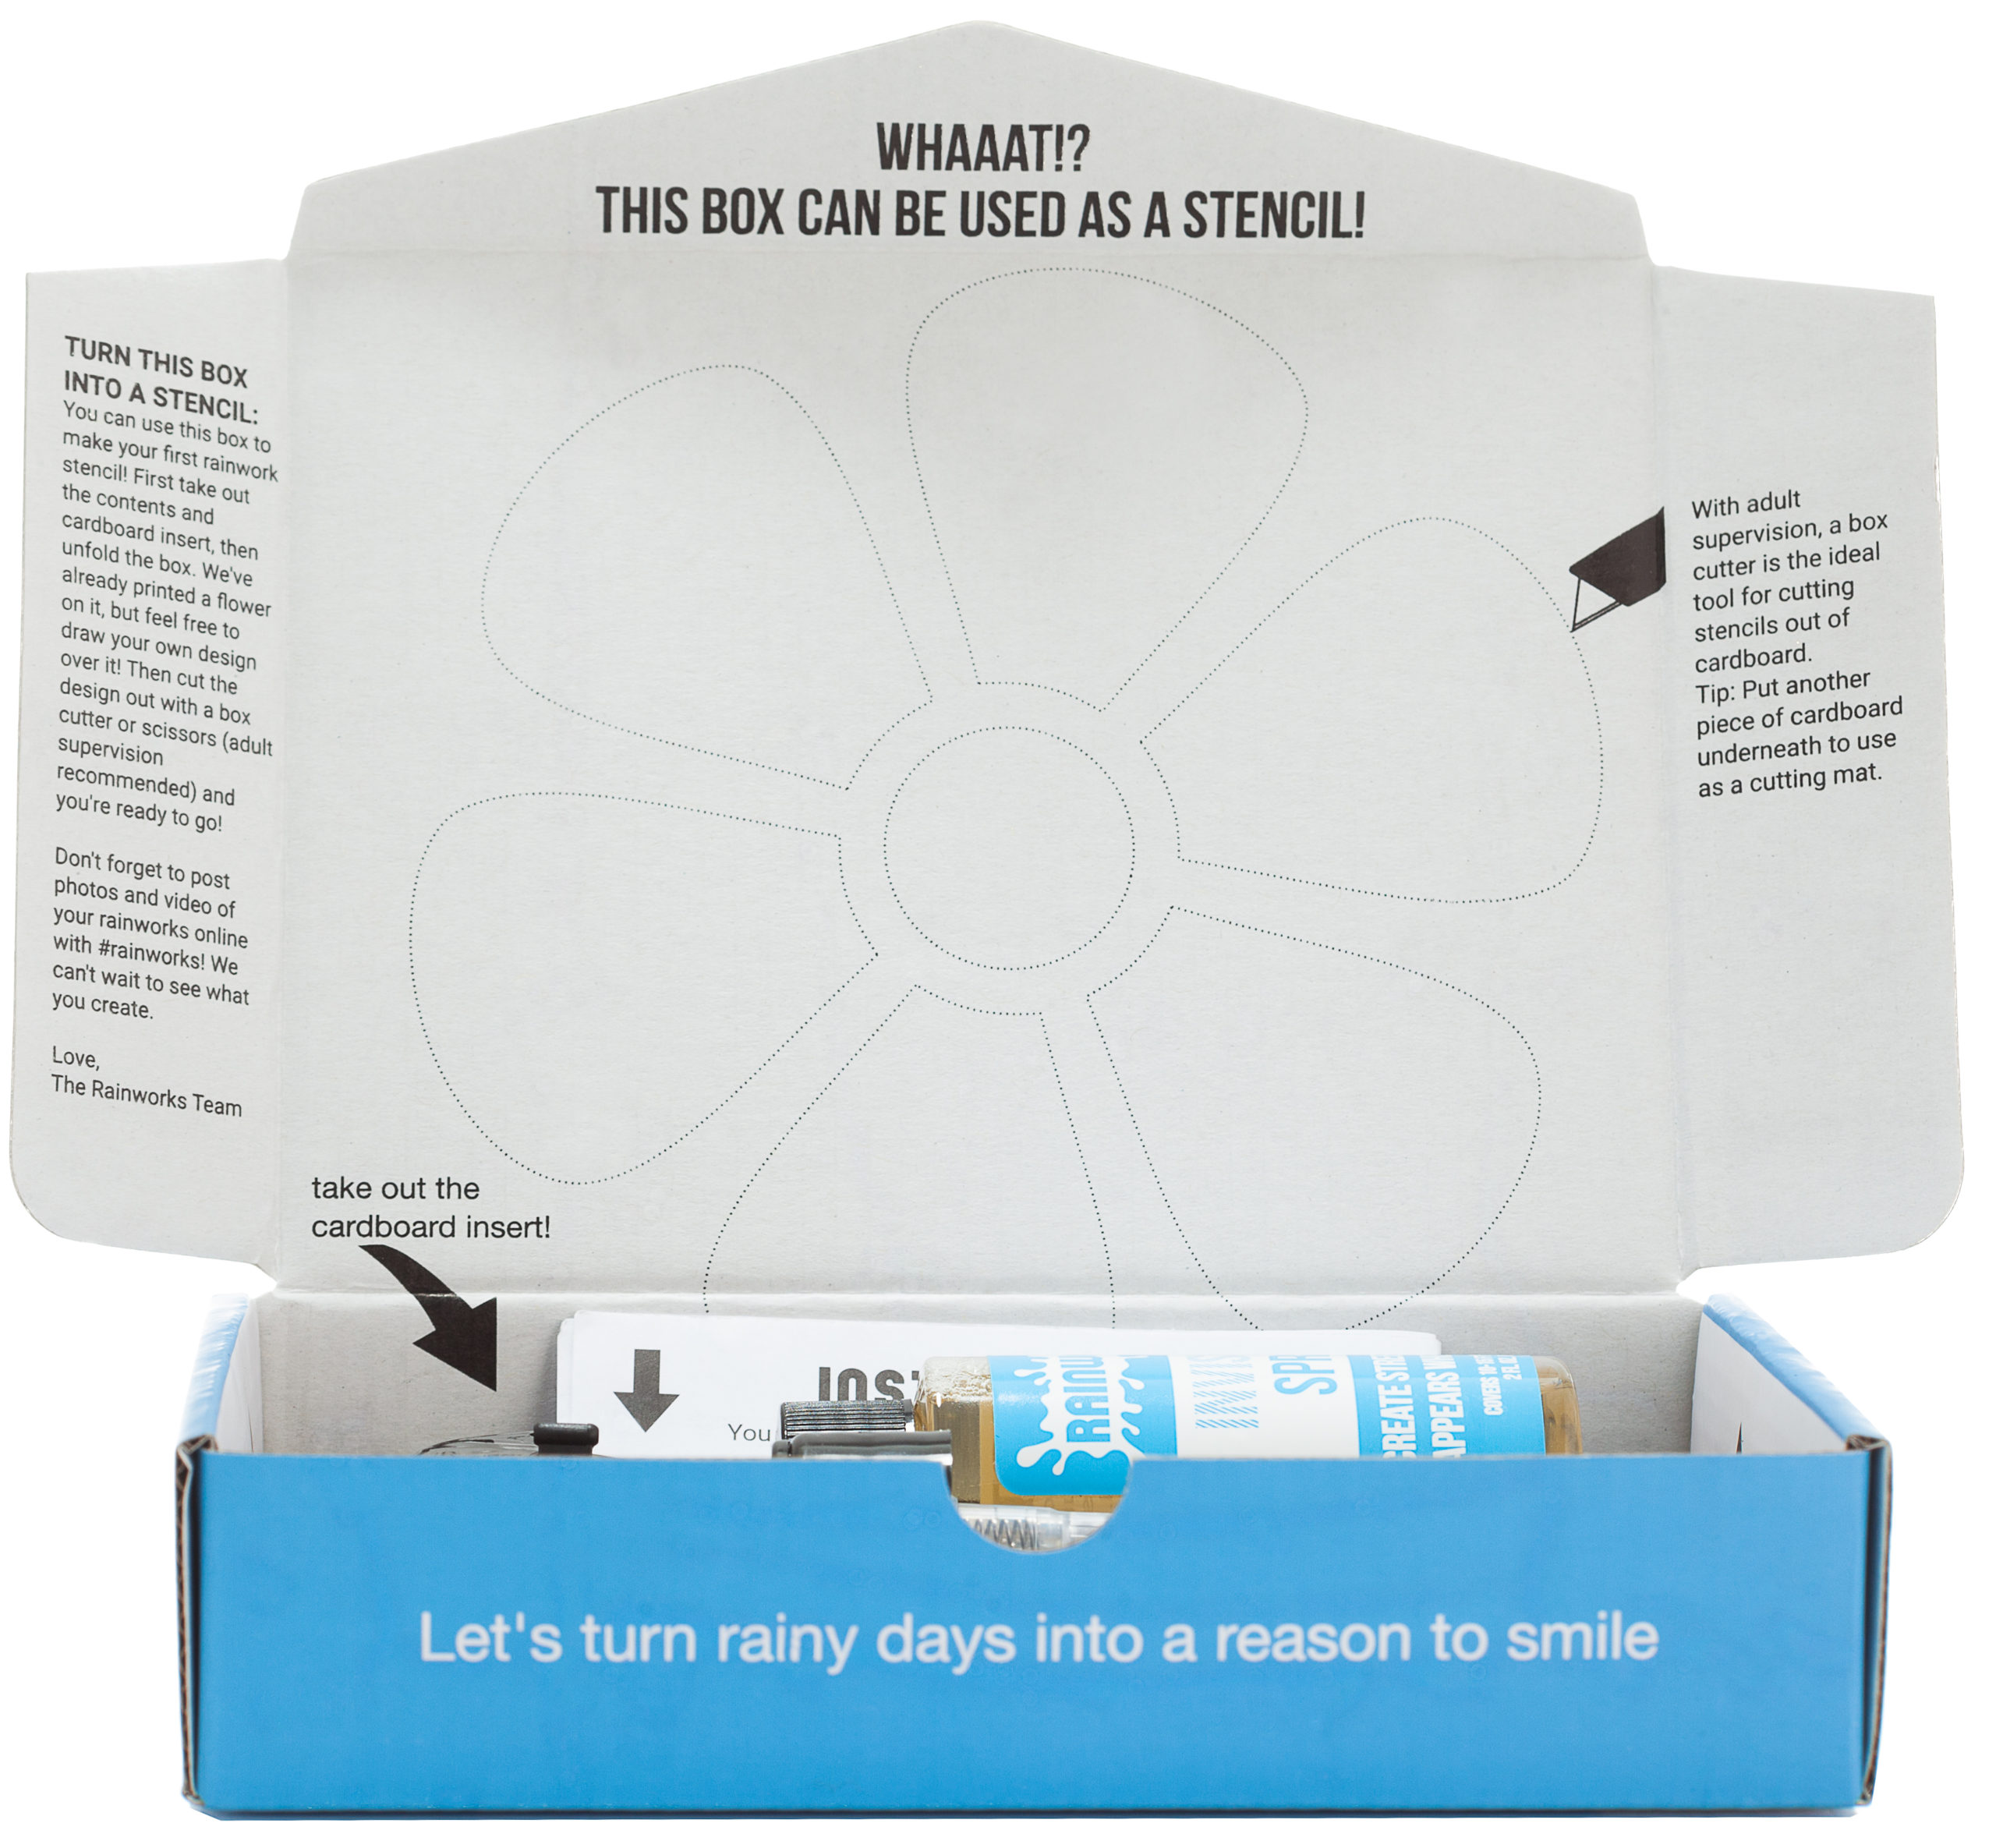 Rainworks Invisible Spray Street Art Kit - opened